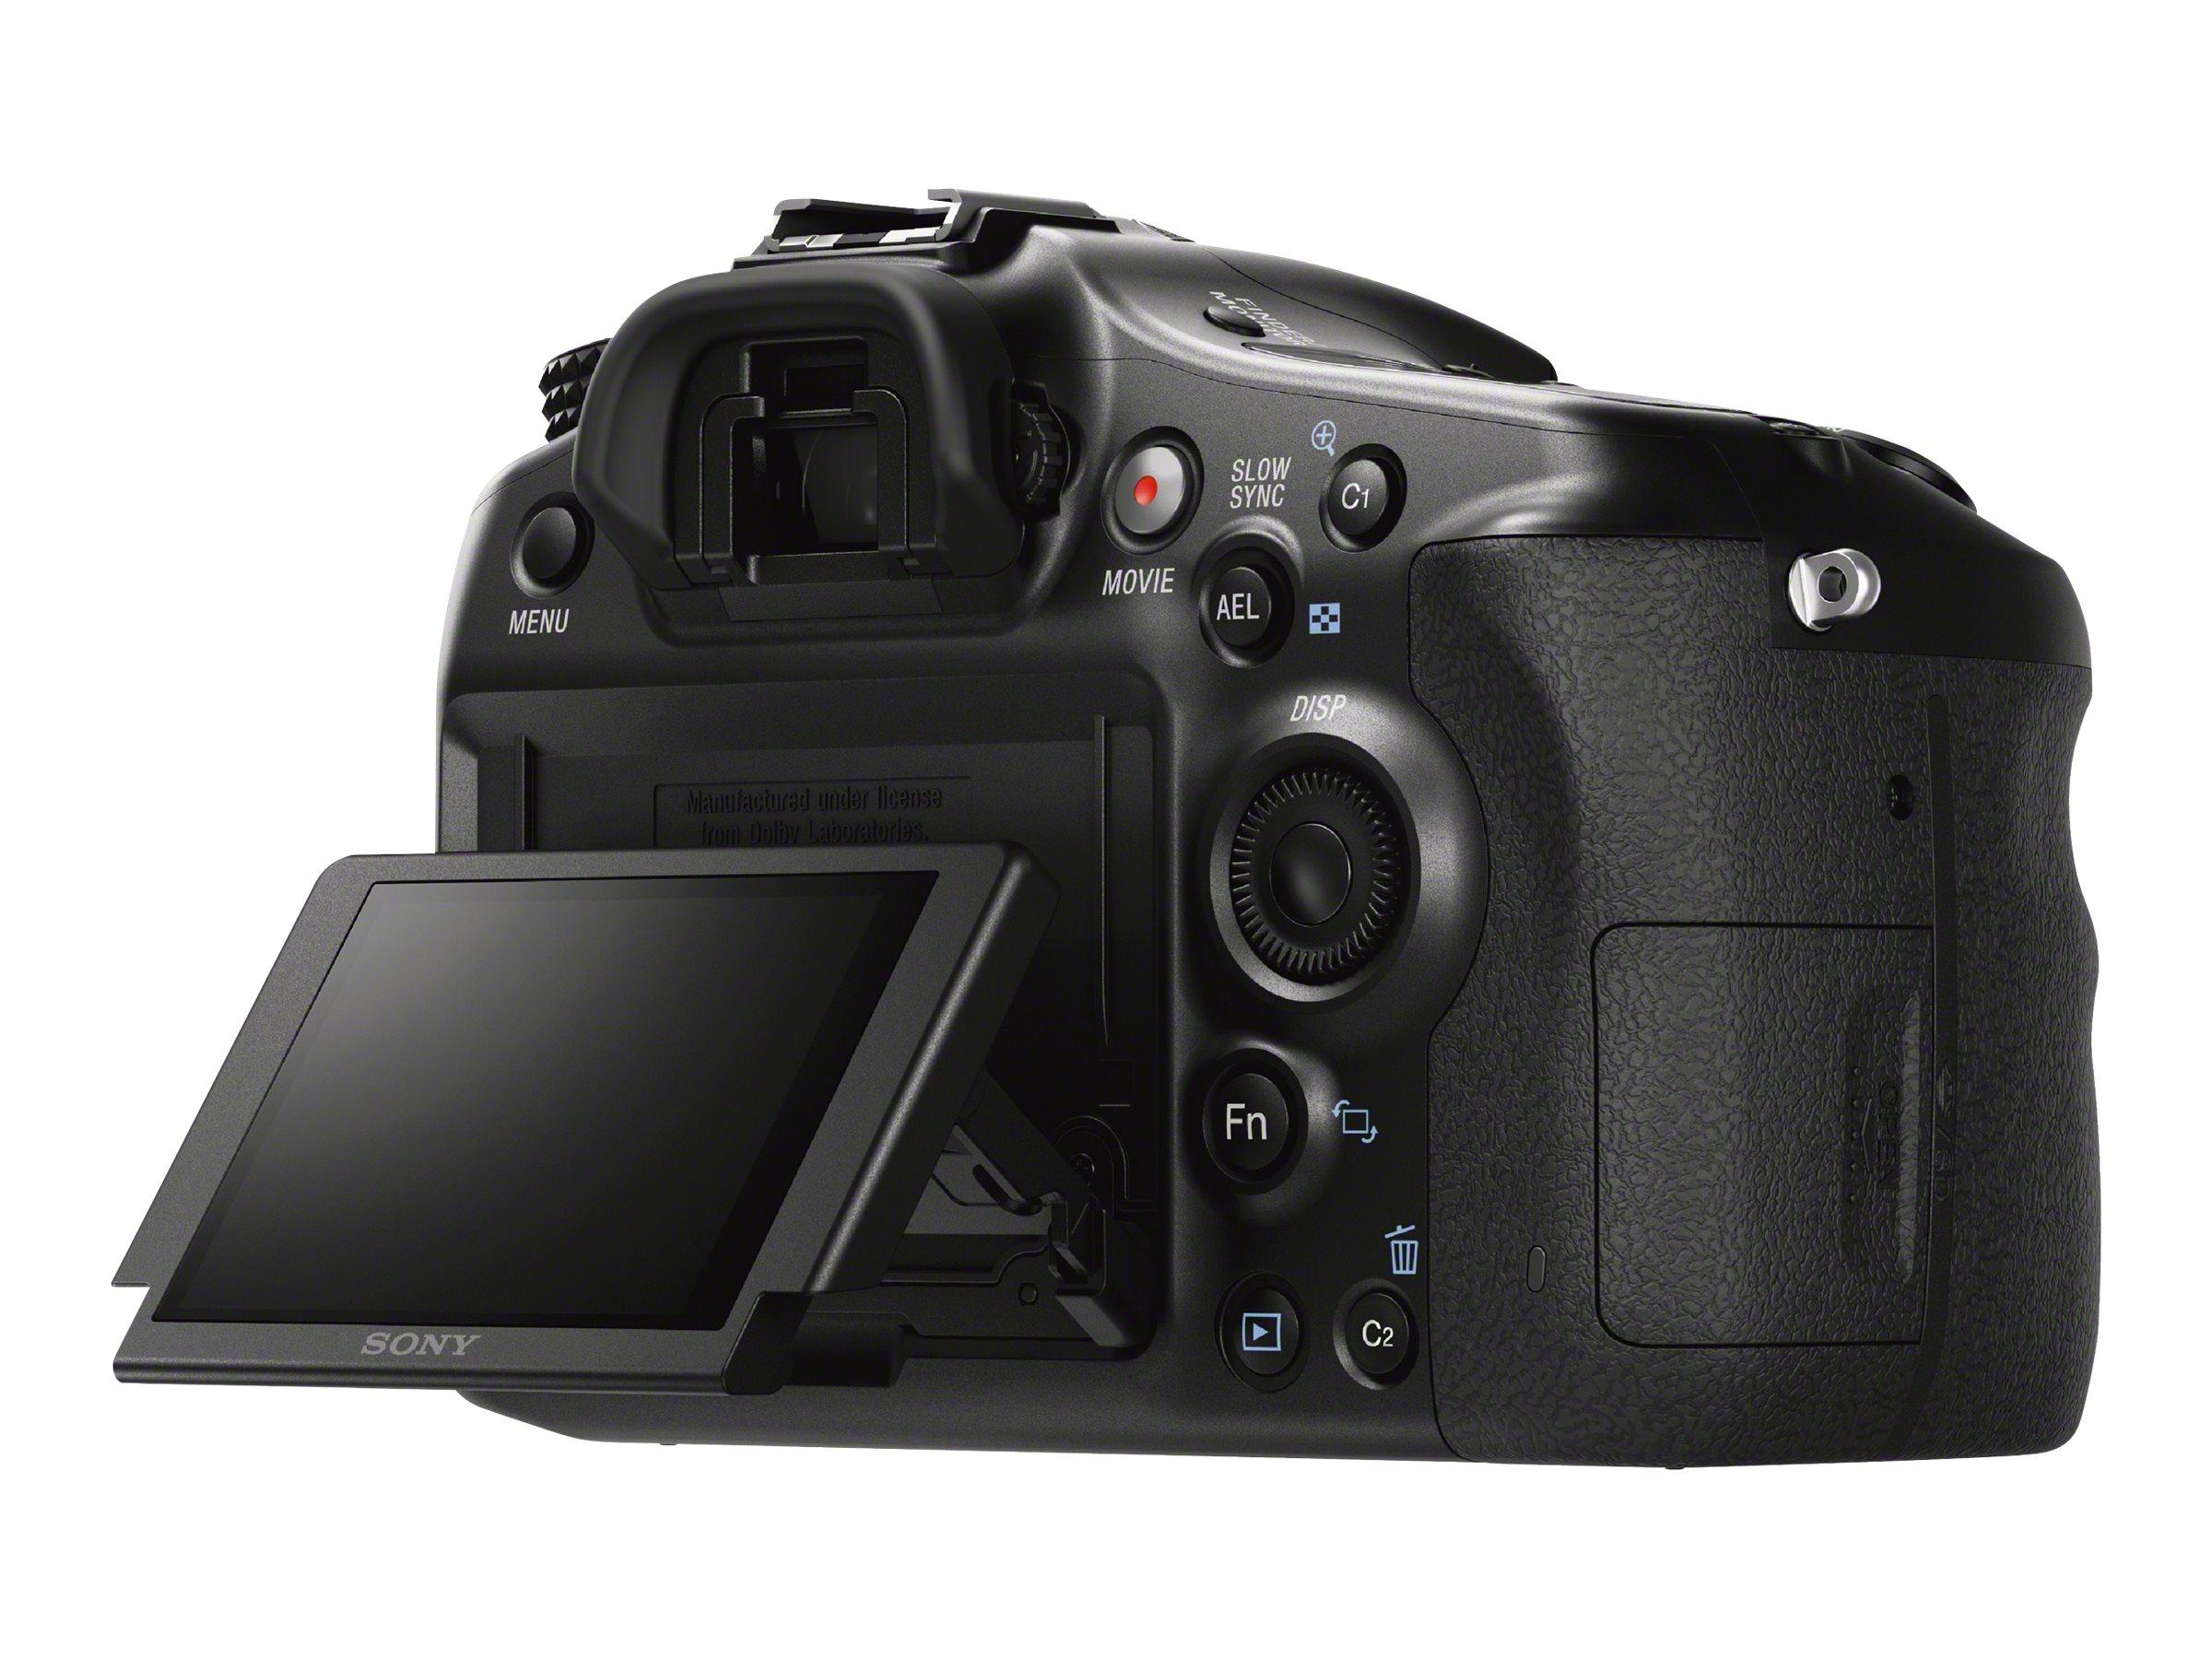 Sony a68 ILCA-68 - Digitalkamera - SLR - 24.0 MPix - APS-C - 1080p / 50 BpS